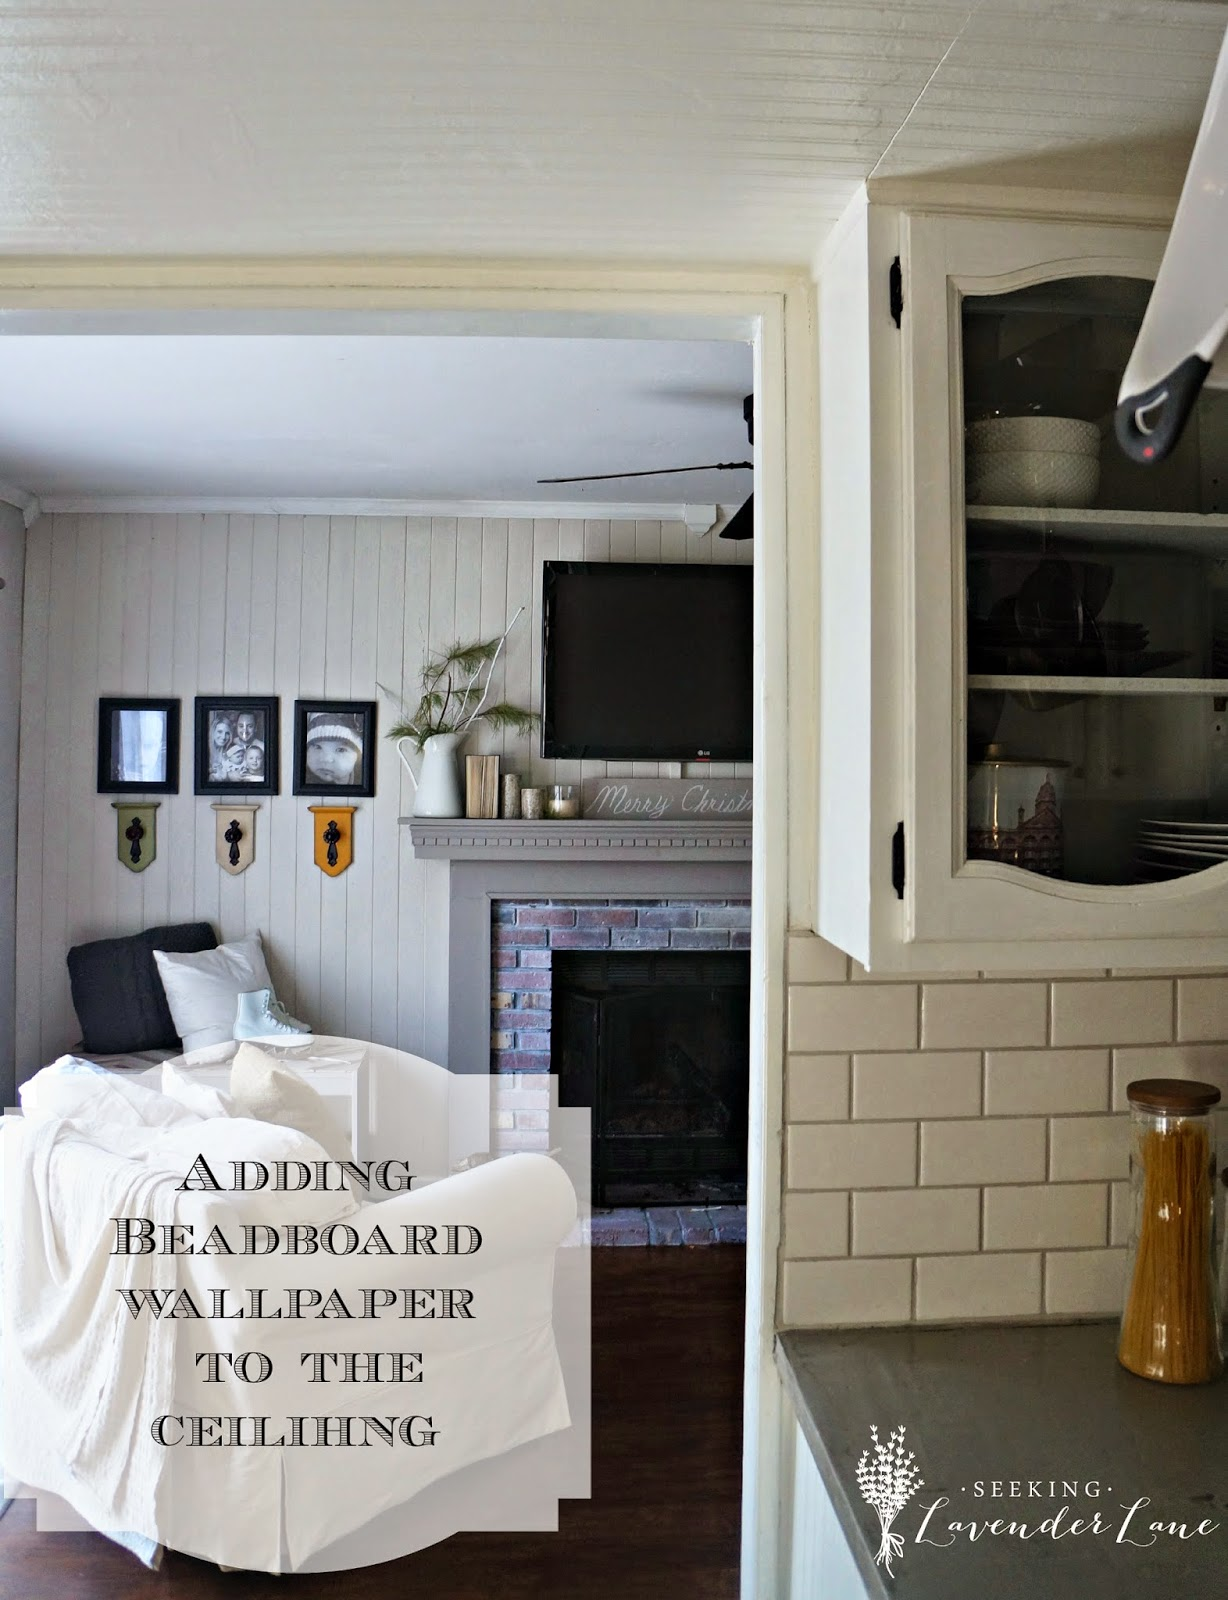 Adding Beadboard Wallpaper to our Kitchen Ceiling - Seeking Lavendar on beadboard kitchen walls, beadboard butcher block kitchen, beadboard kitchen cabinets,